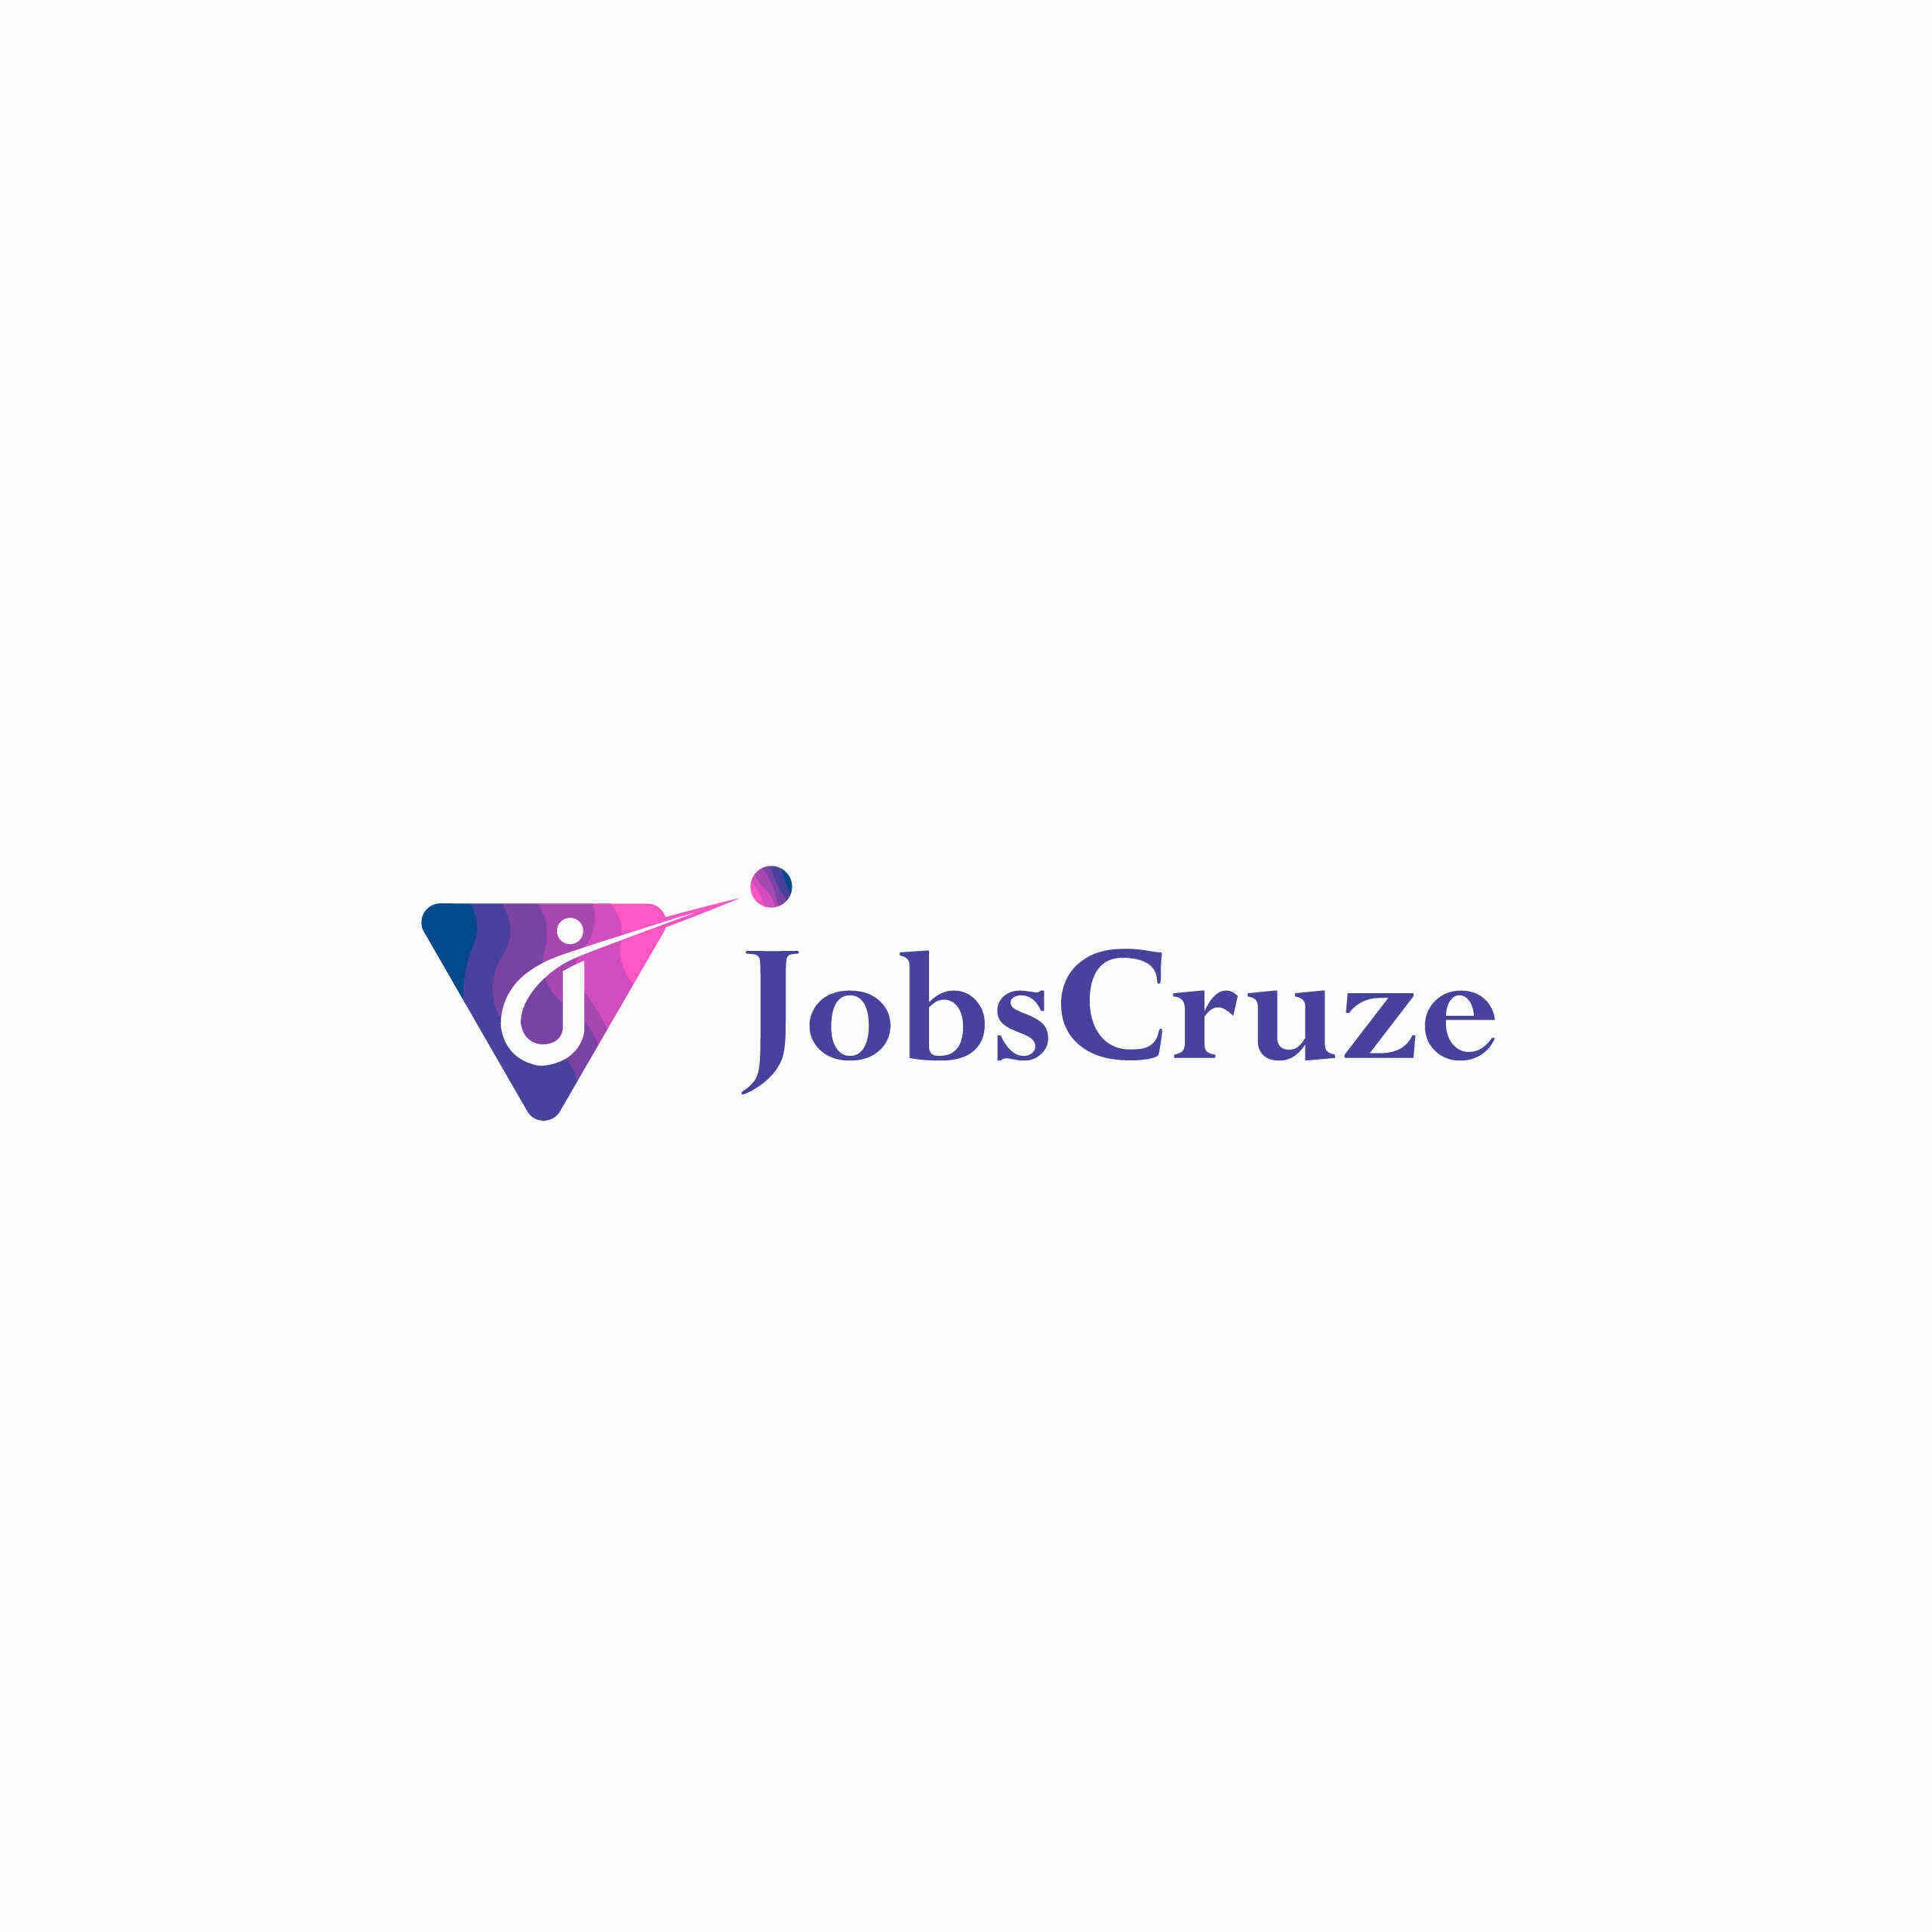 JobsCruze